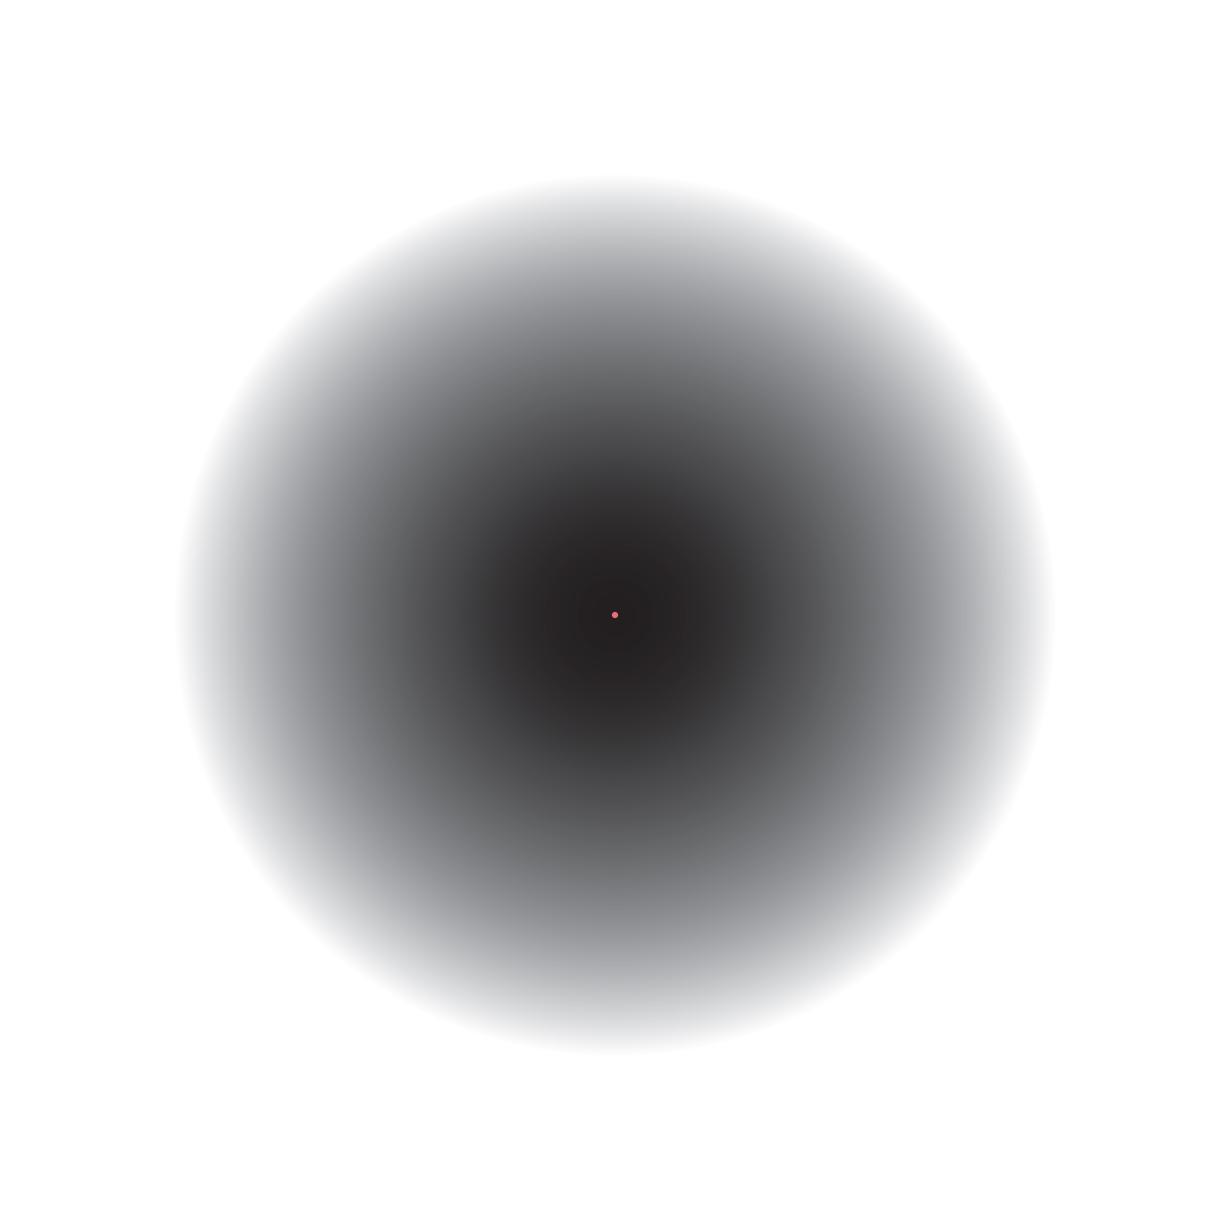 scientific illustration of an atom